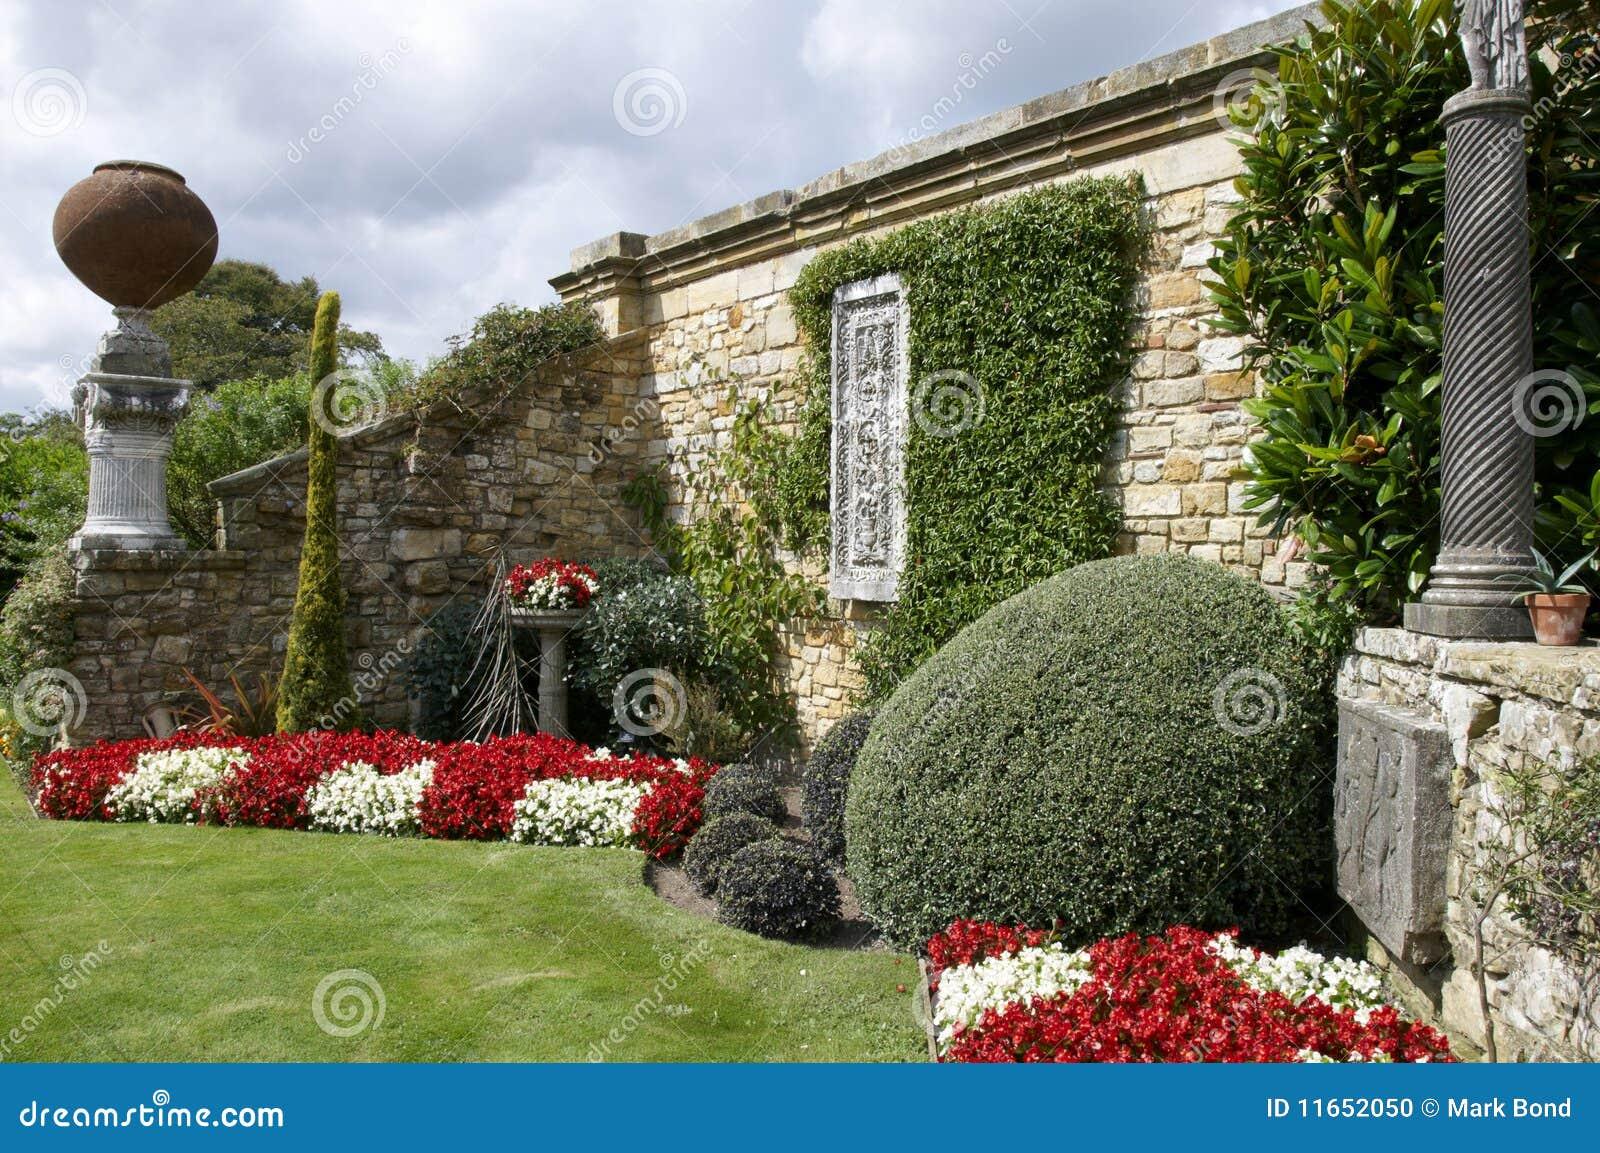 wandgarten stockfoto bild 11652050. Black Bedroom Furniture Sets. Home Design Ideas